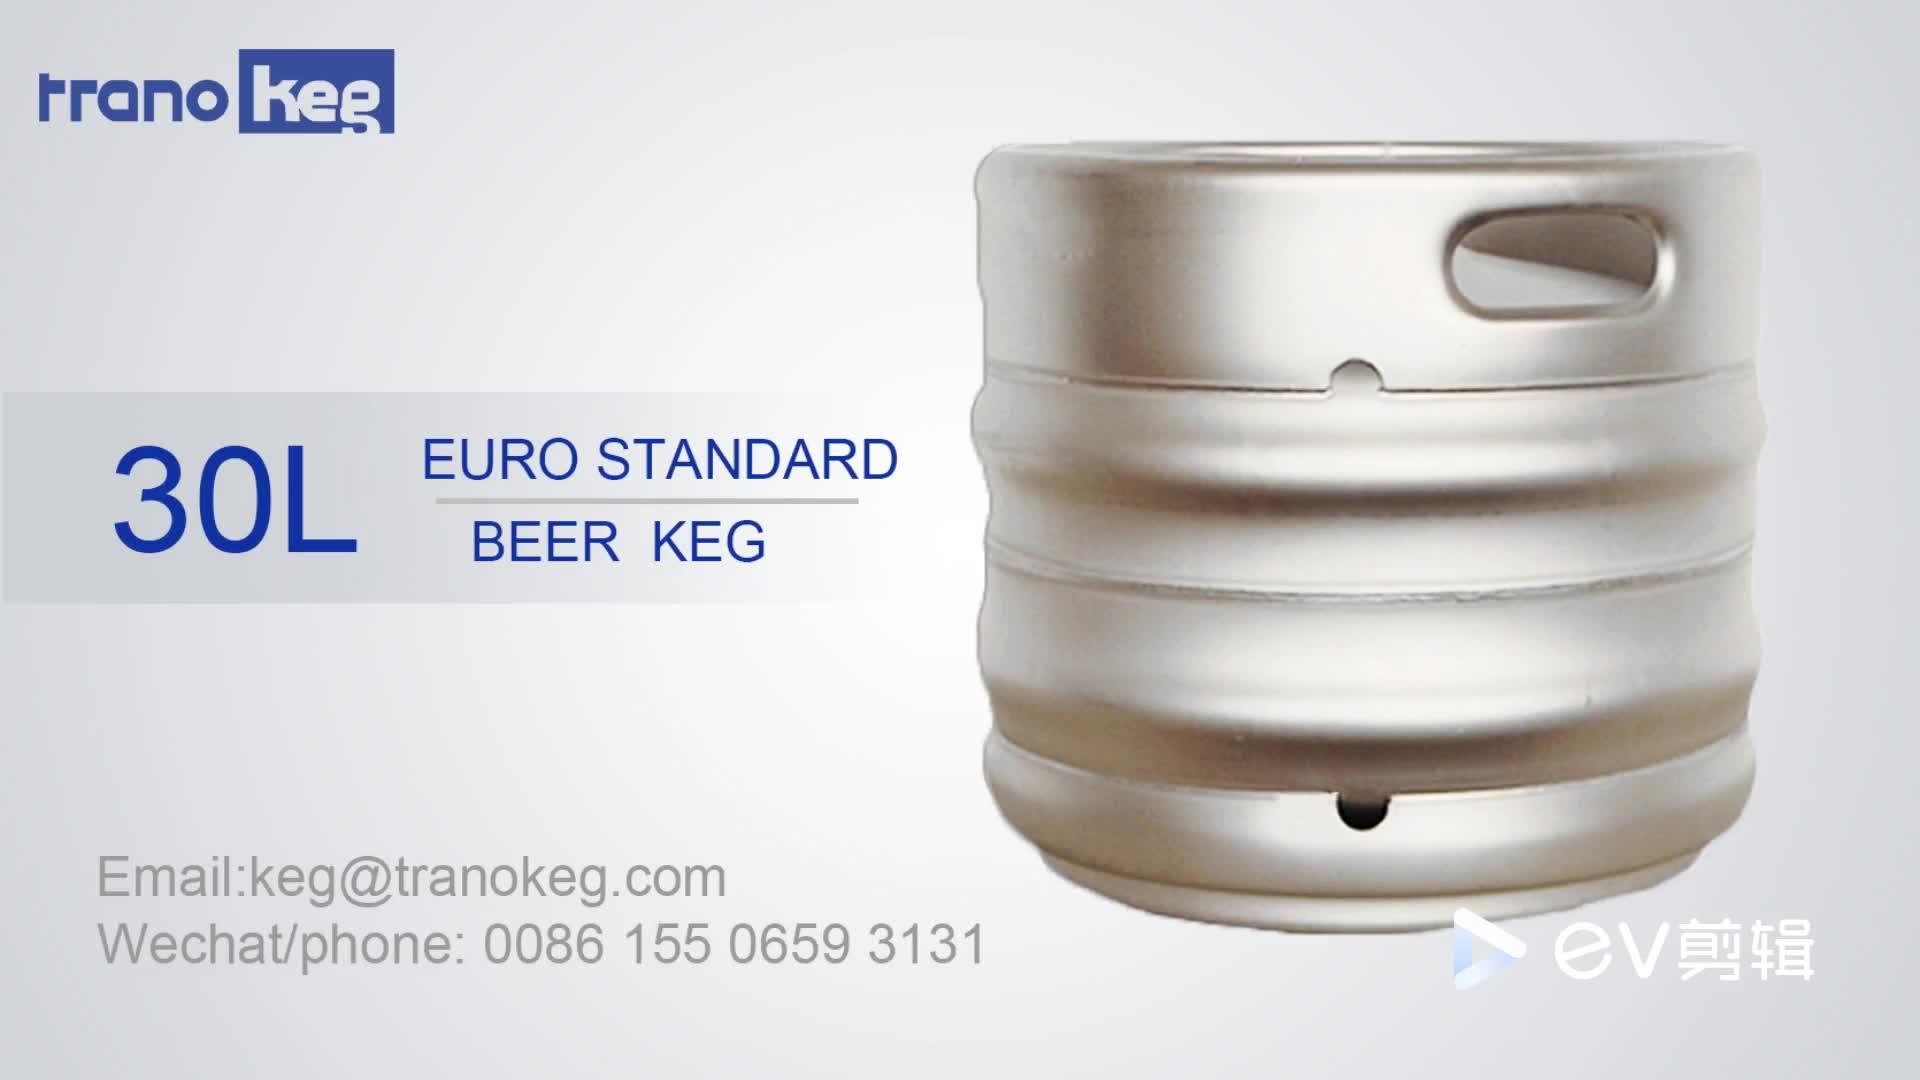 Beliebte AISI 304 oder 316 Food grade edelstahl behälter trommel entwurf leere Euro bier fass 30L barrel